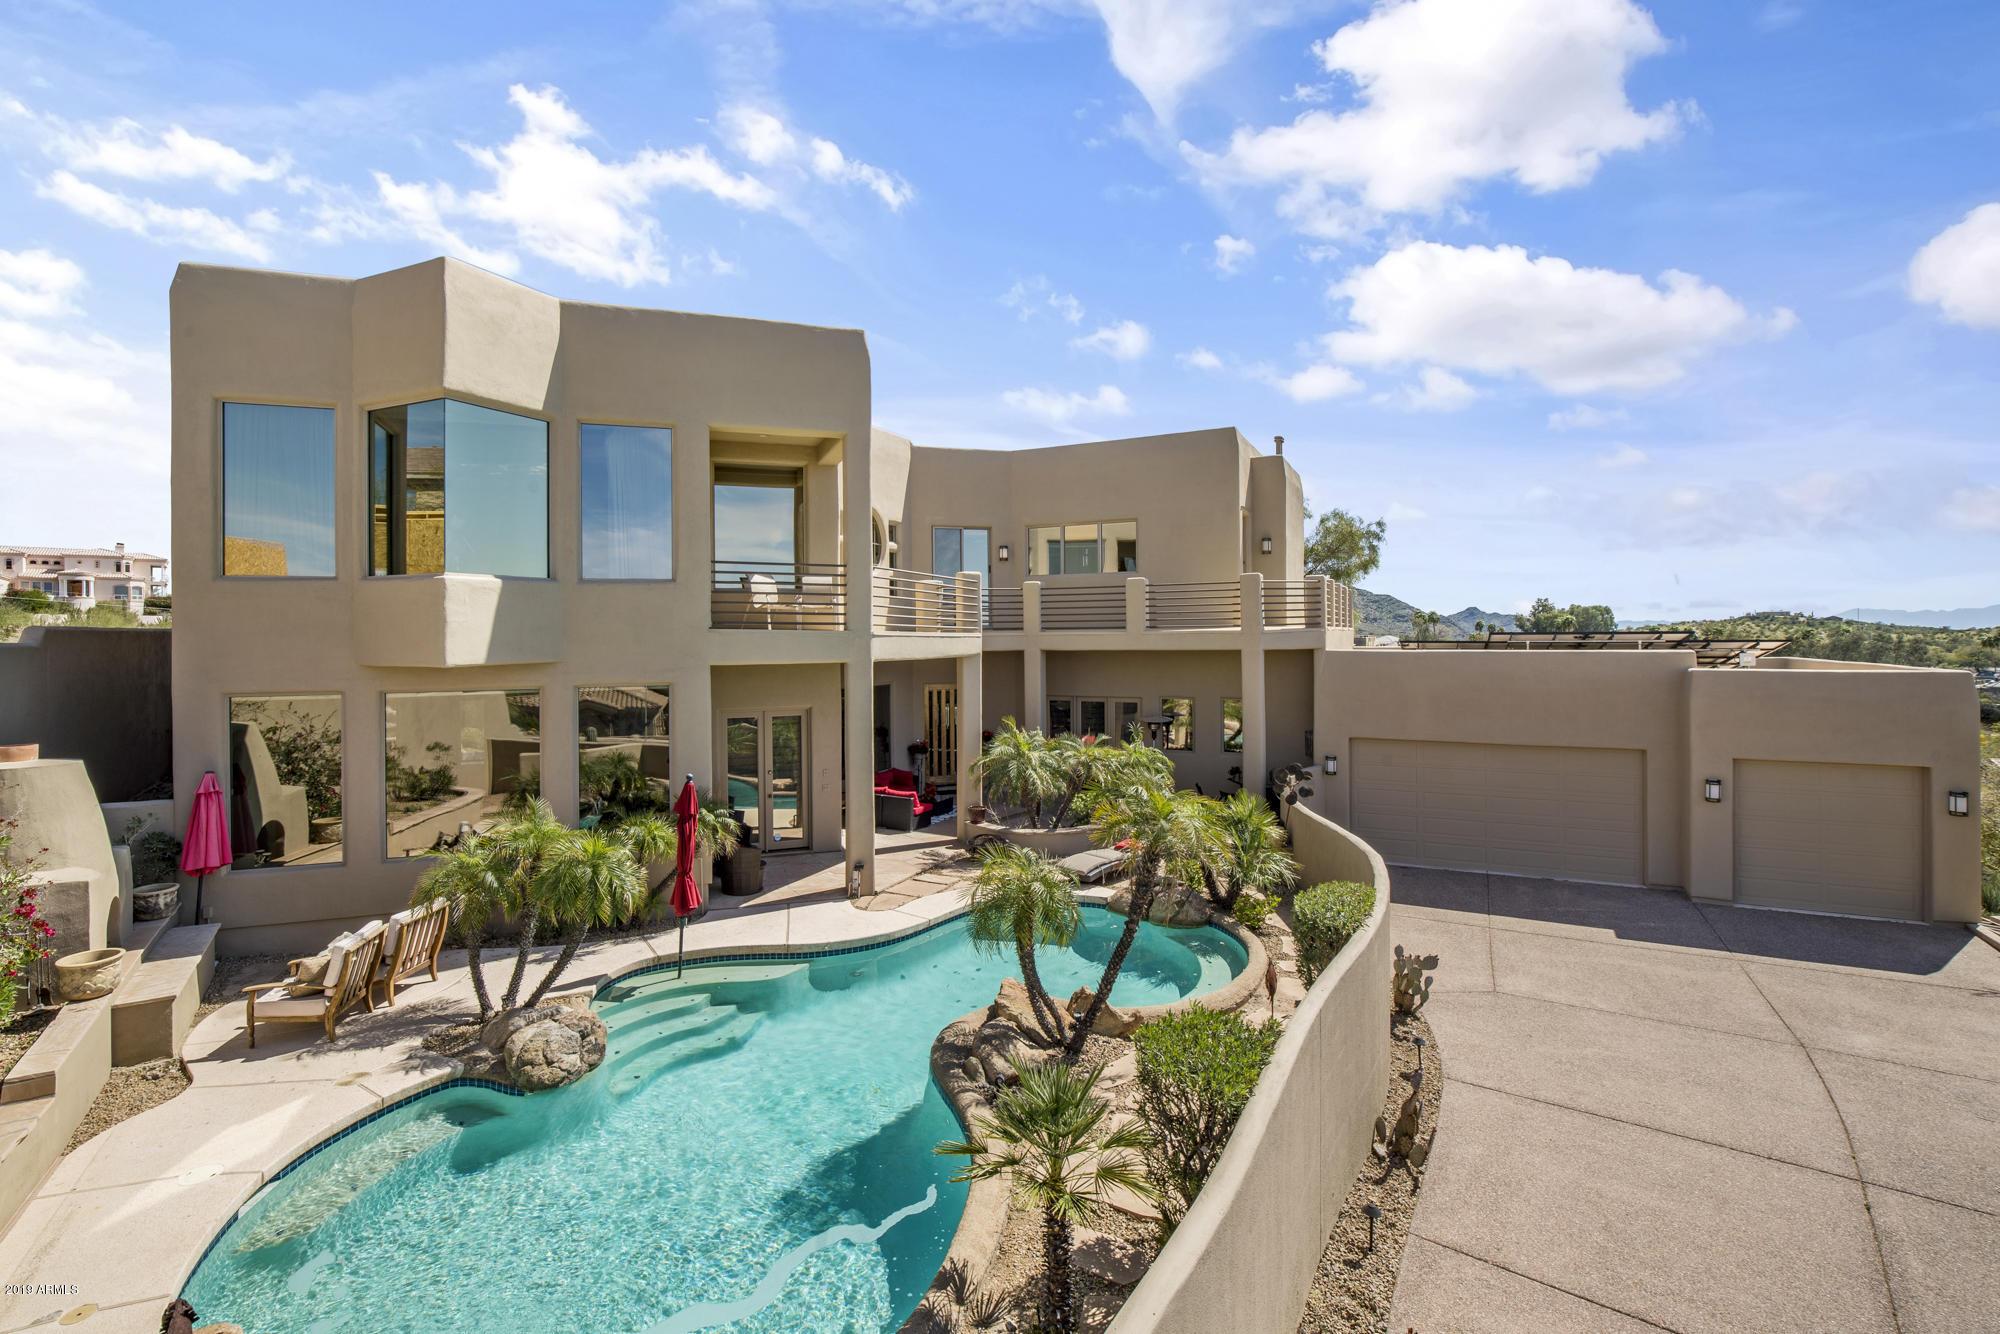 Photo for 12653 N 17th Place, Phoenix, AZ 85022 (MLS # 5964578)